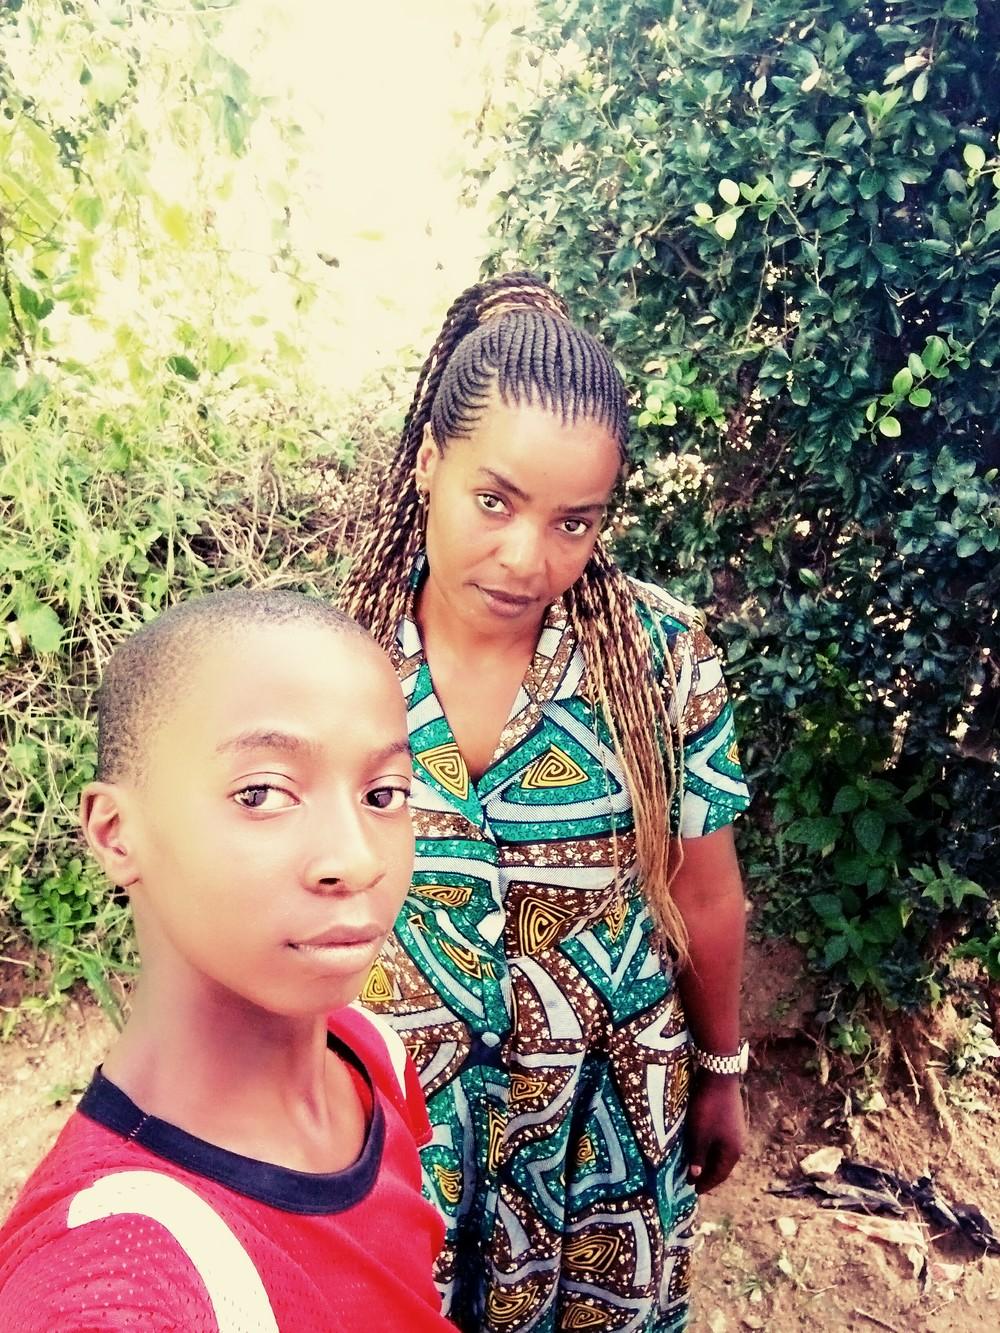 Owen MwamkingaPhoto